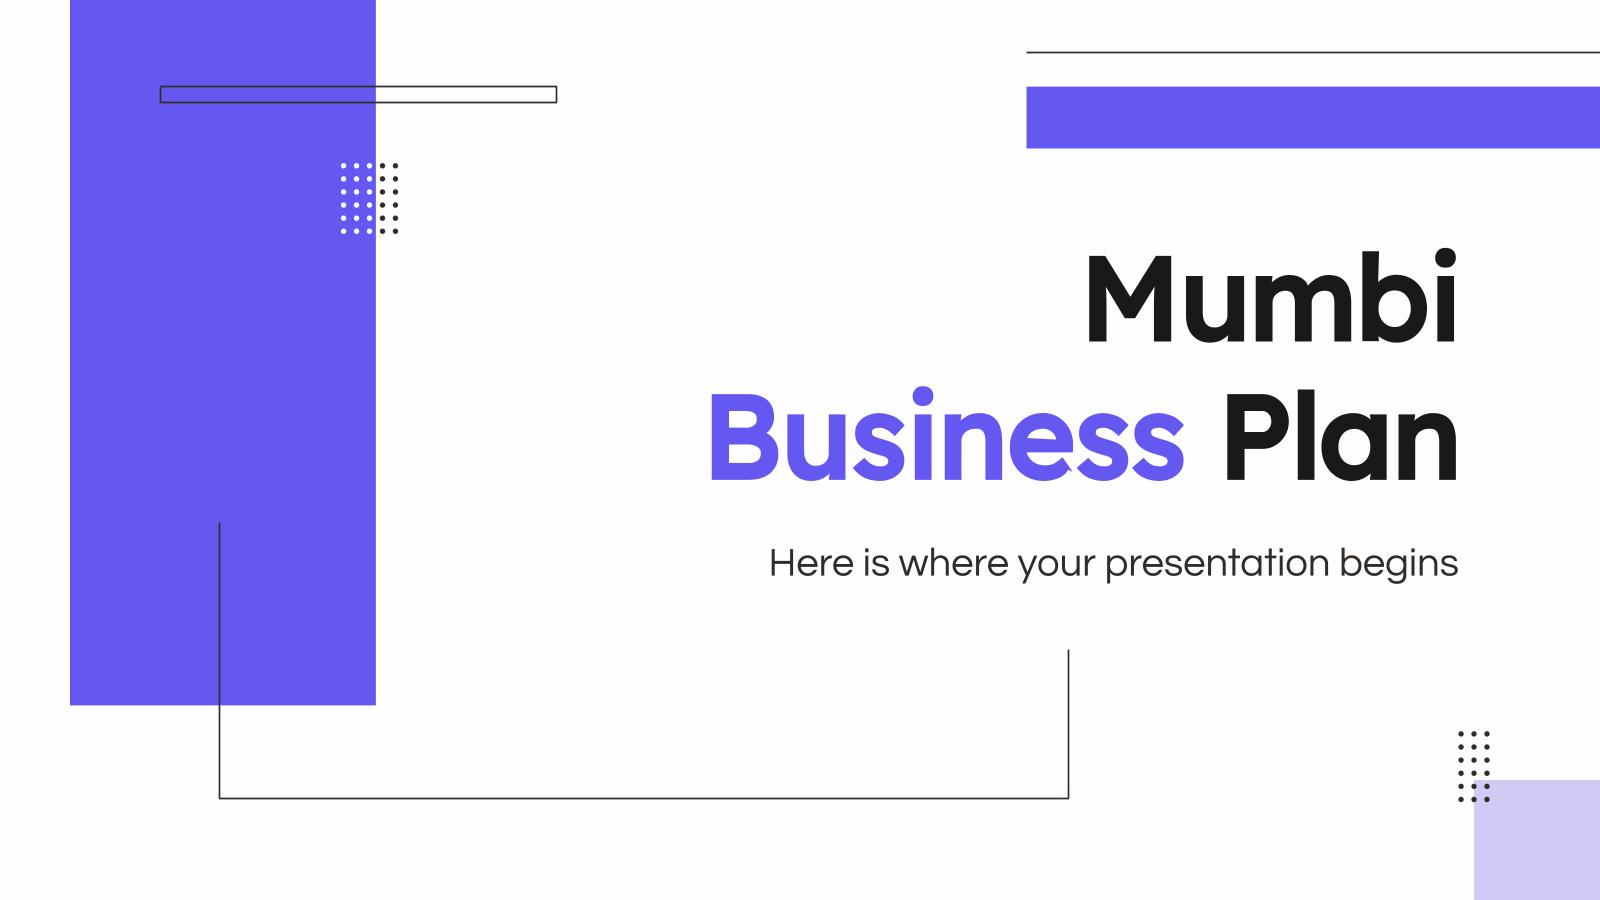 Plantilla de presentación Plan de negocios mumbi